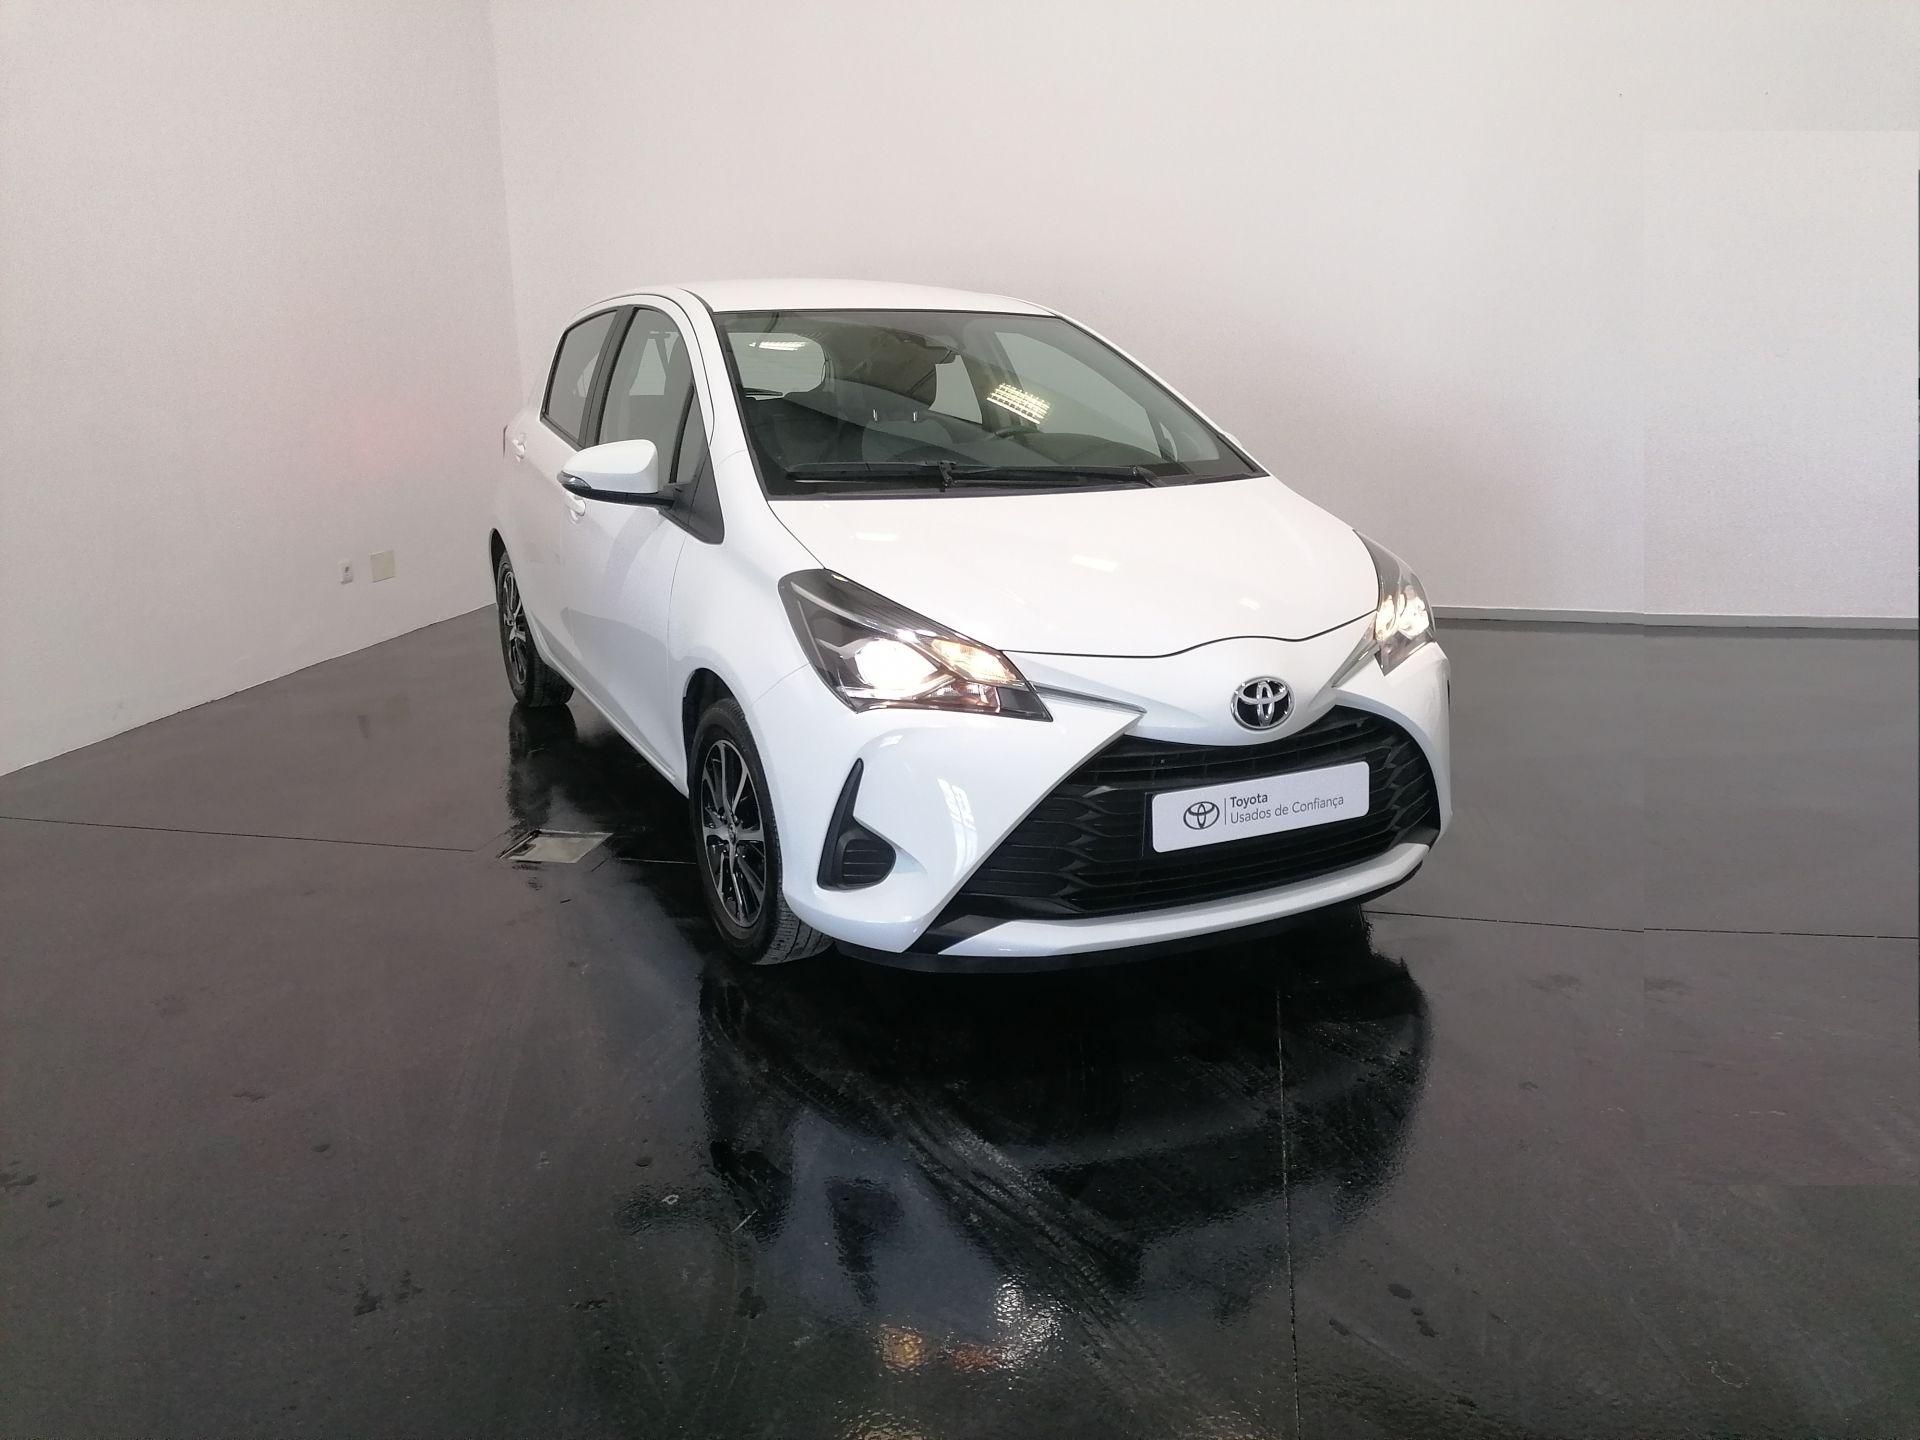 Toyota Yaris 1.0 5P Comfort segunda mão Santarém